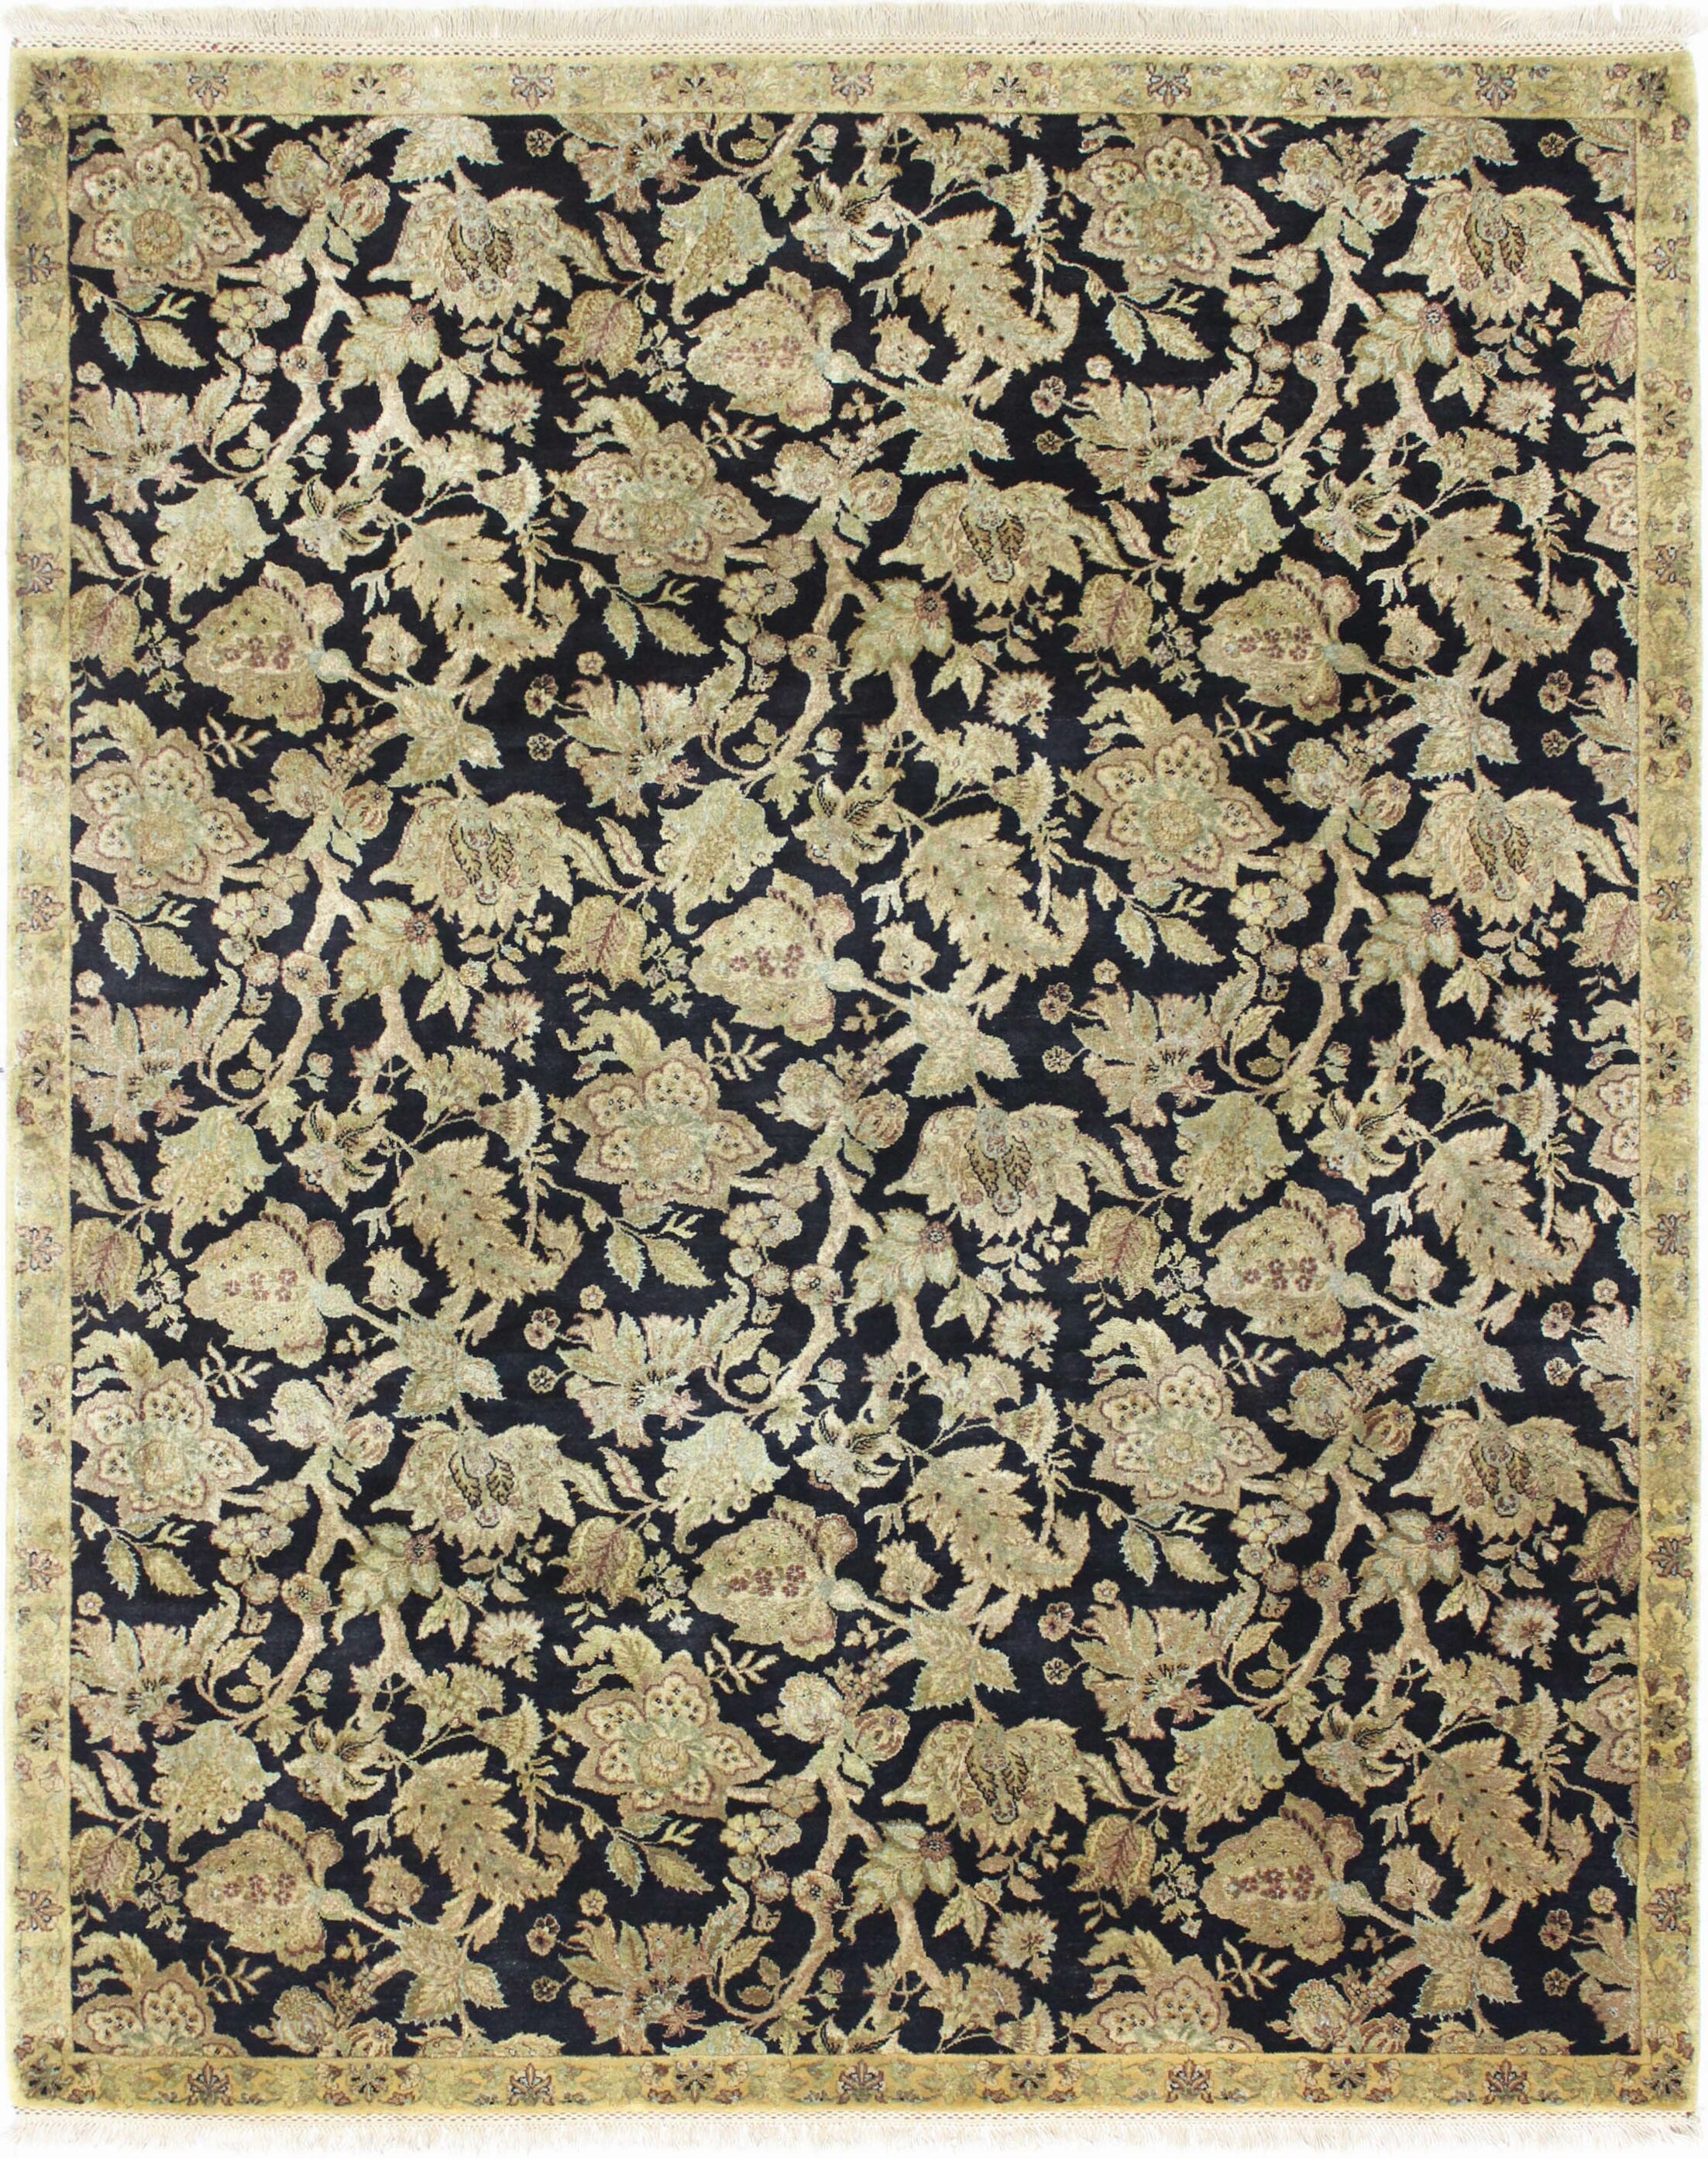 One-of-a-Kind Brogan Jaipur Genuine Oriental Hand-Knotted Wool Black/Beige Area Rug